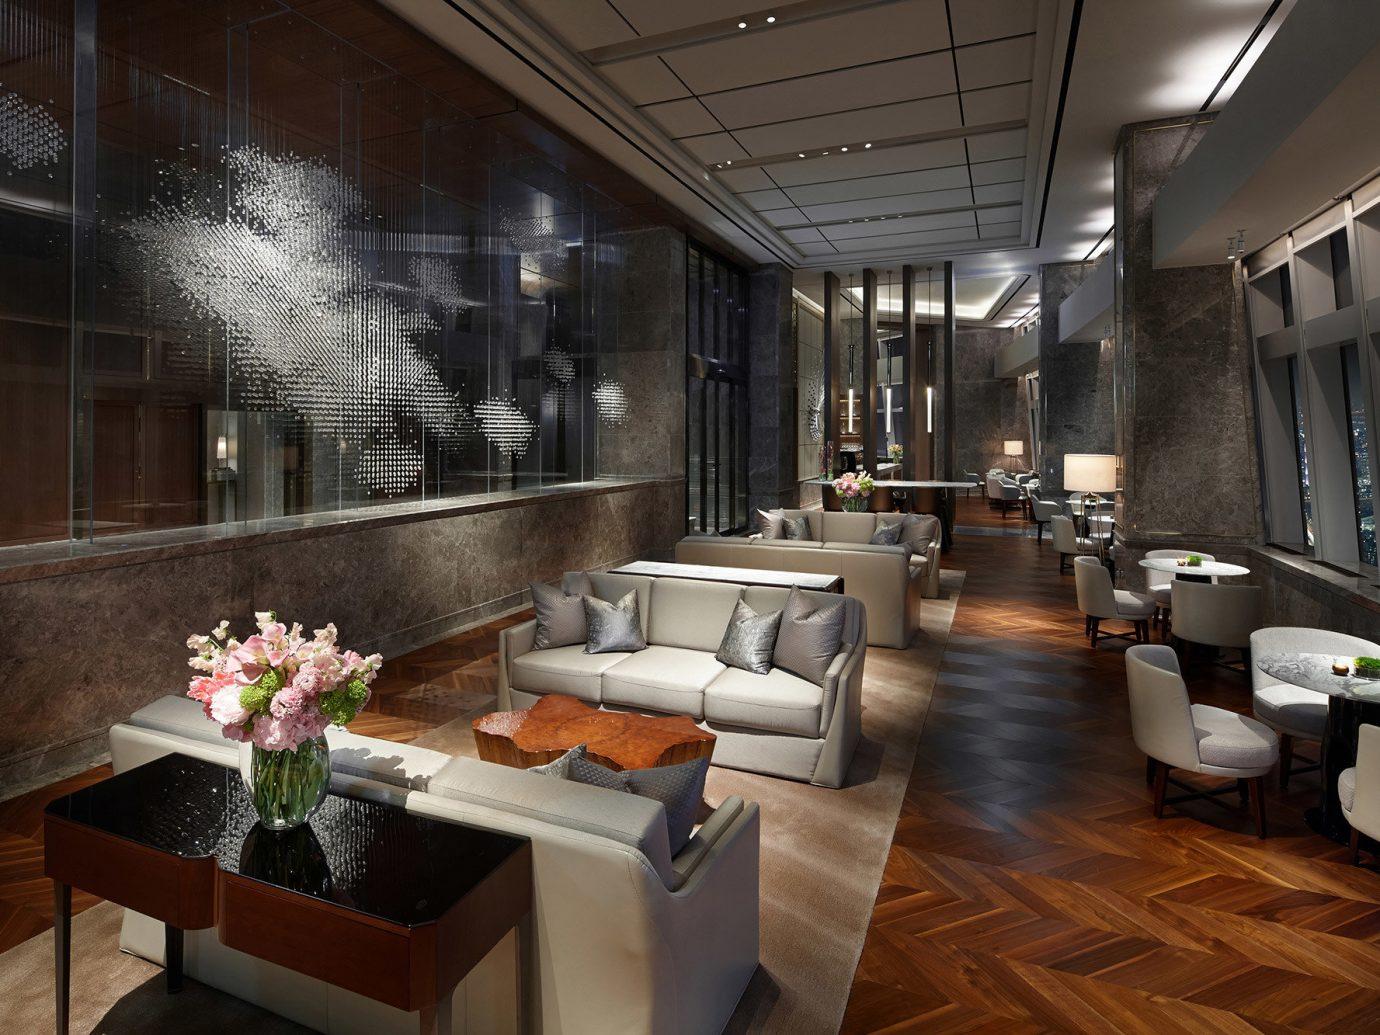 Hotels Luxury Travel table indoor floor interior design room Lobby furniture living room loft ceiling interior designer